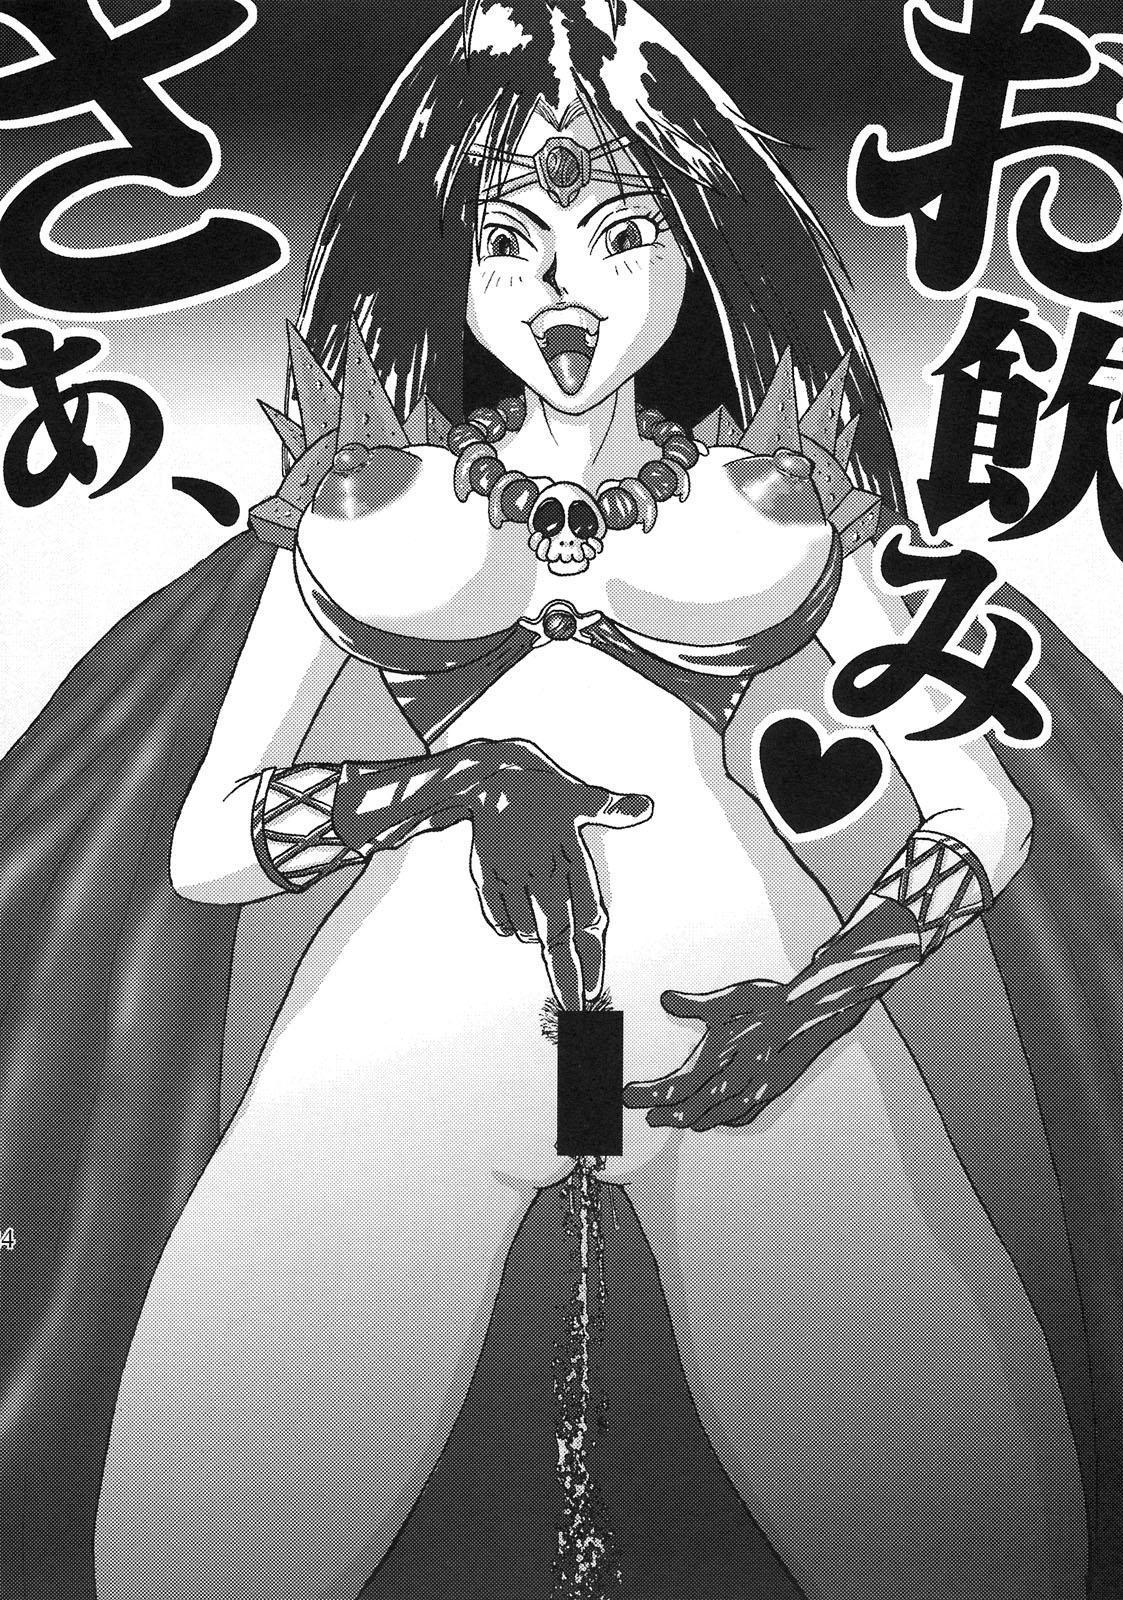 SEMEDAIN G WORKS vol.35 - Shirohebi Ryuu Mata 23